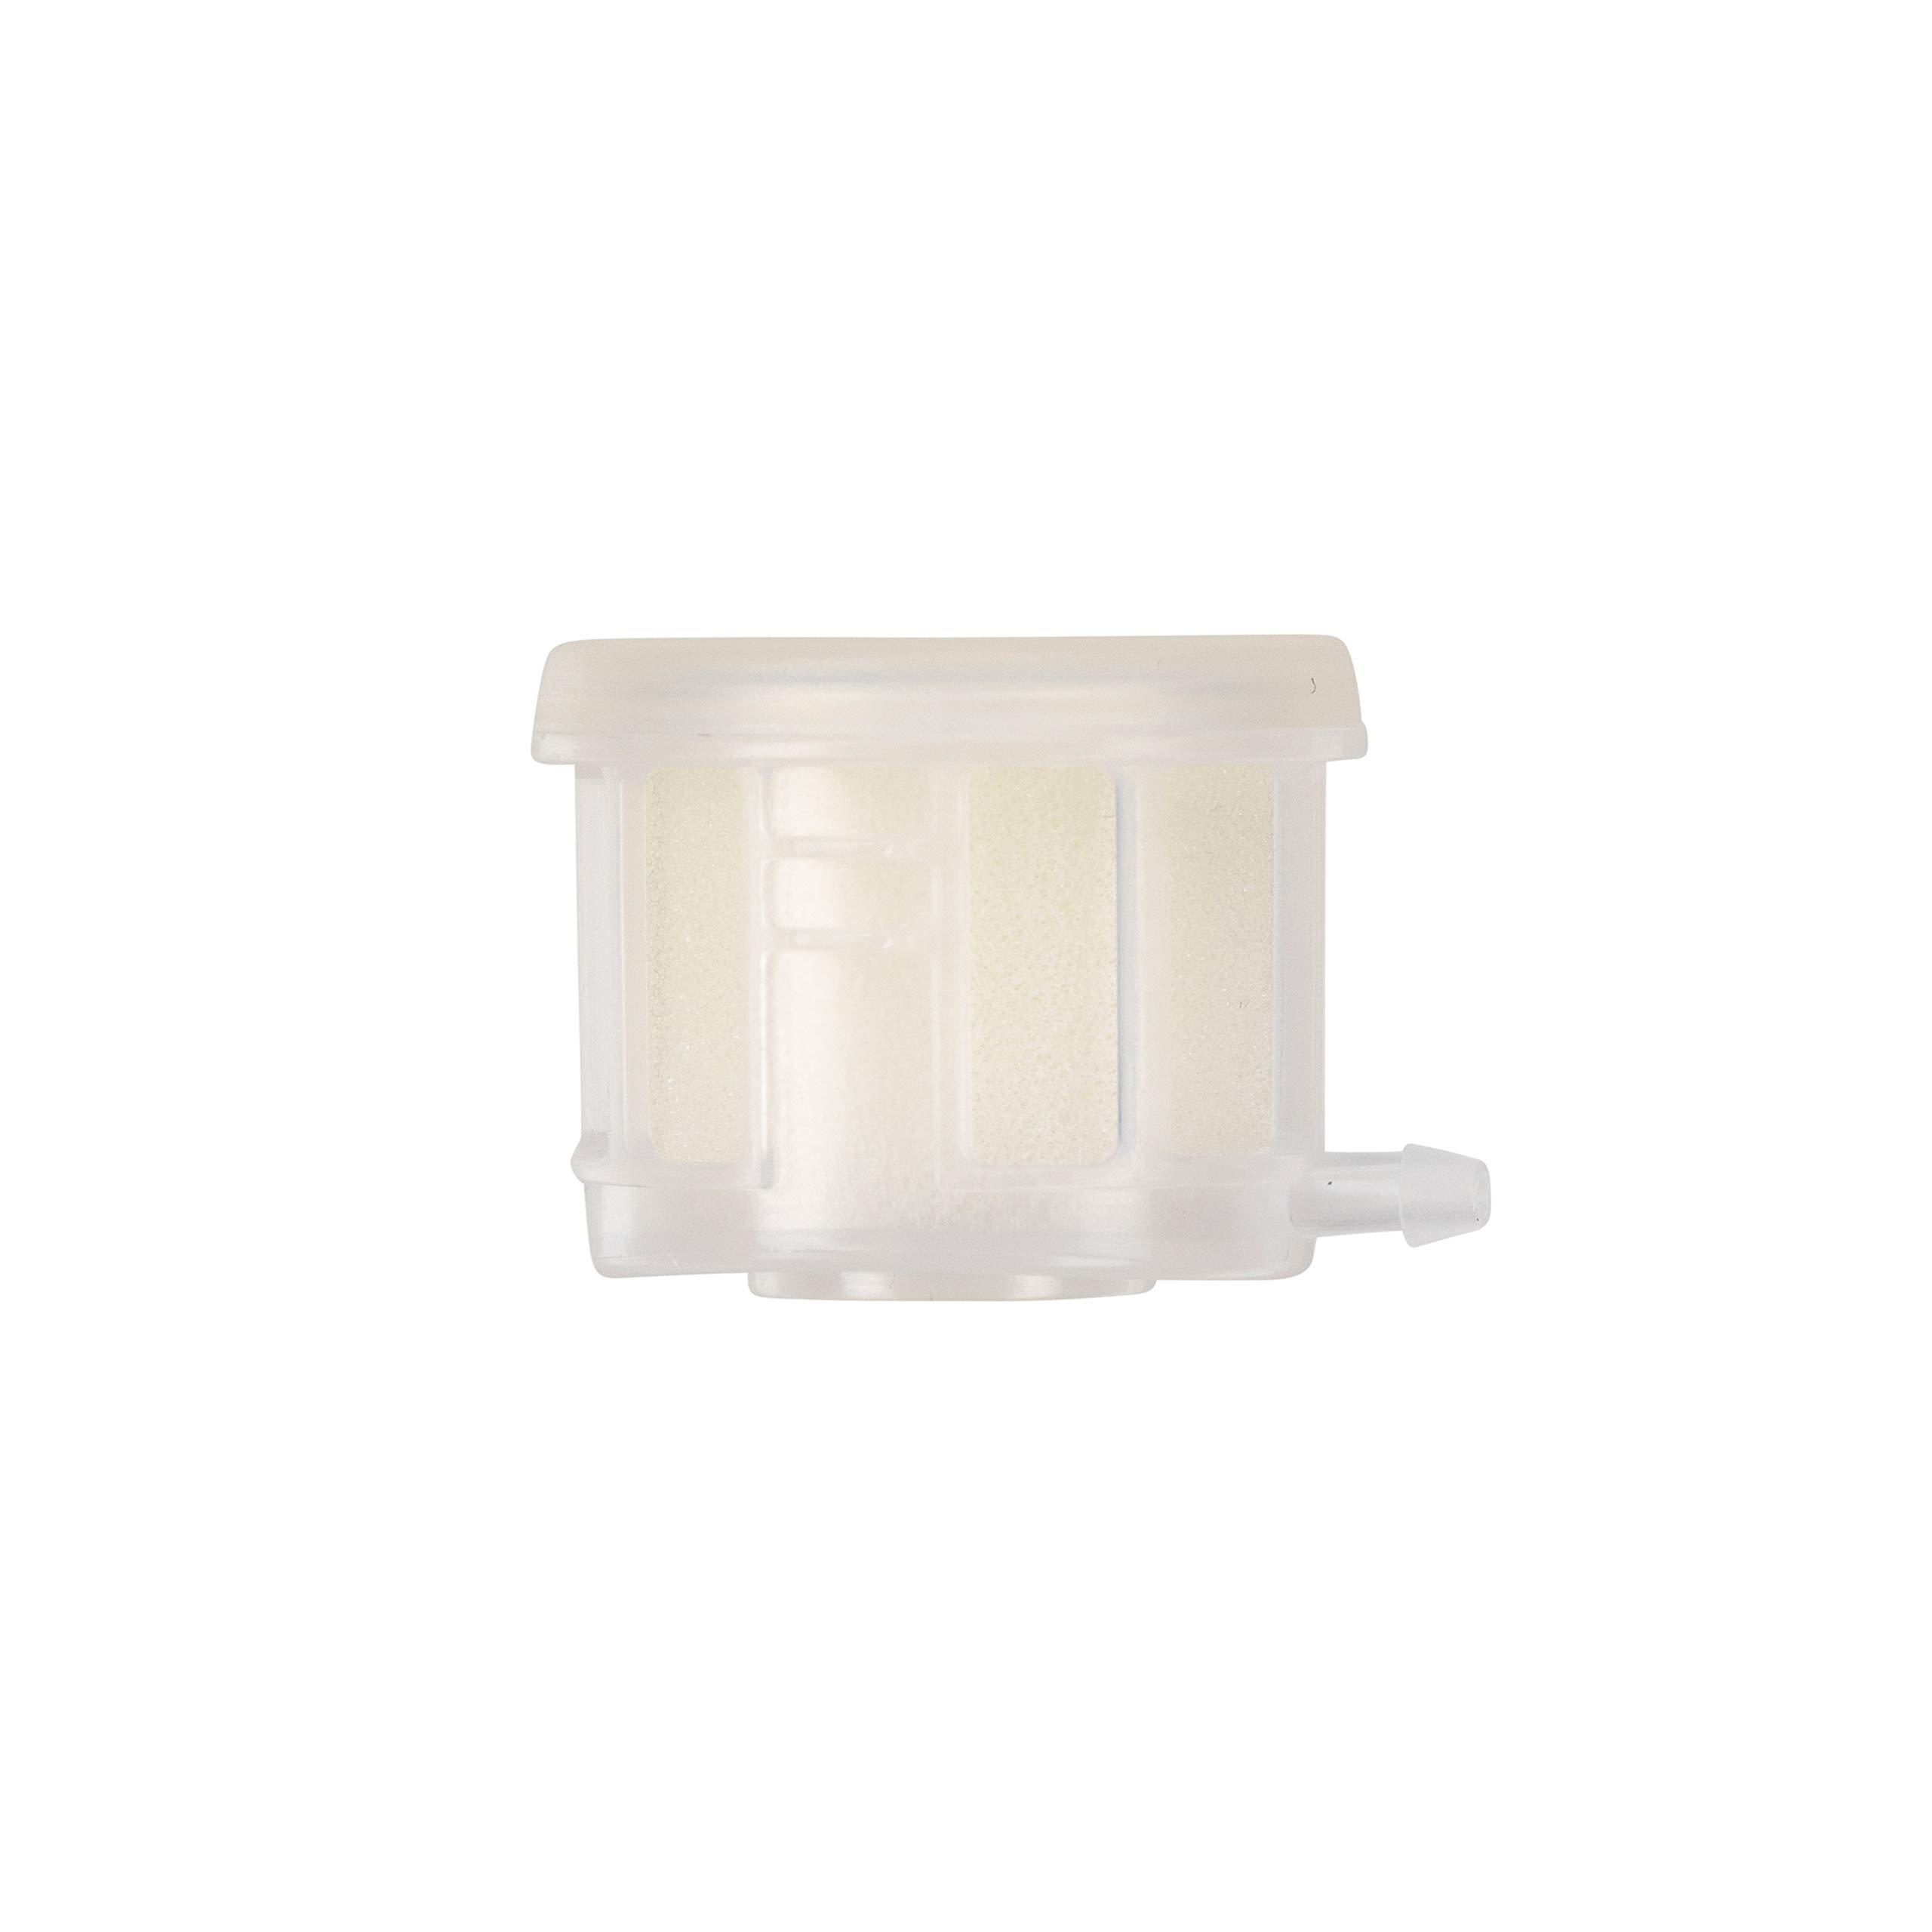 RespVent Tracheostomy Heat and Moisture Exchanger 1000 Oxygen Port, RTG-01050, 50/Box by Respiratory Therapeutics Group